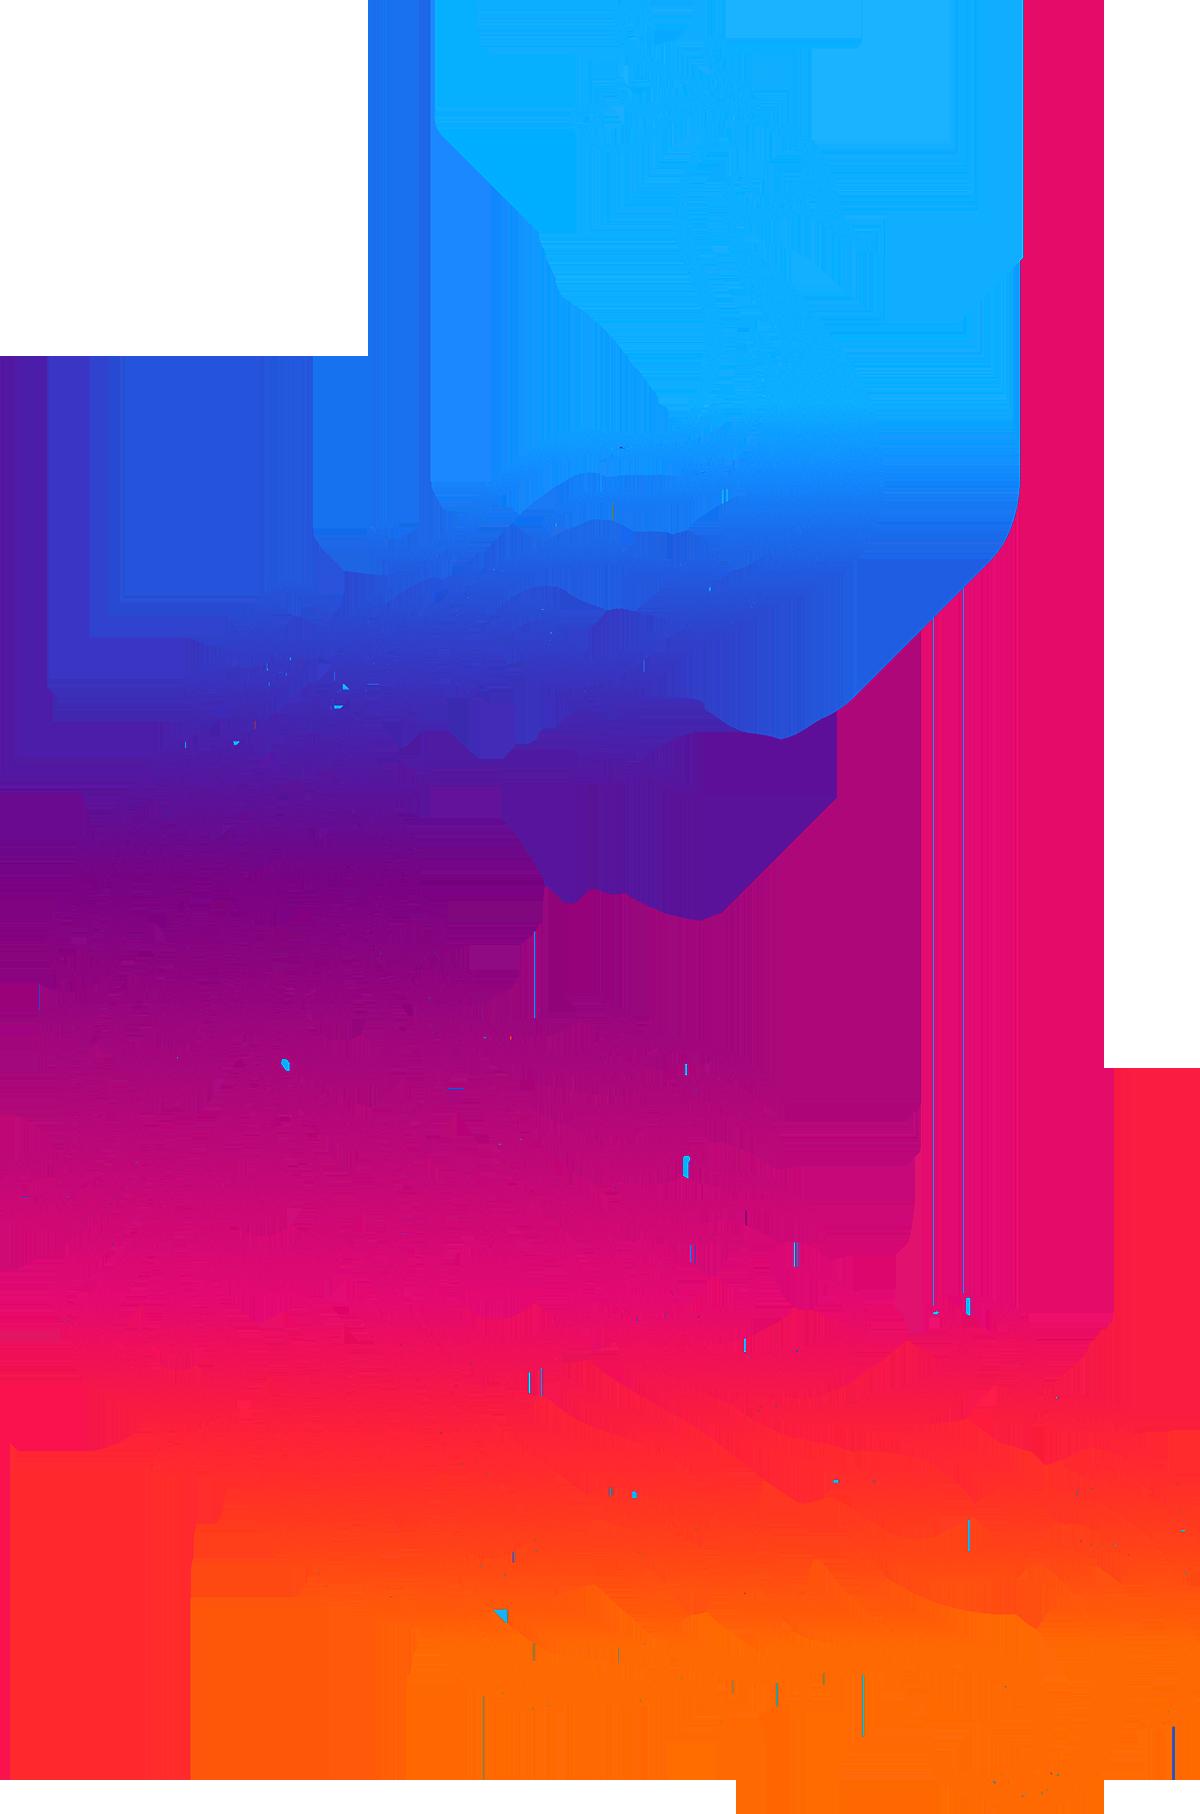 Peafowl Logo Feather Clip art.